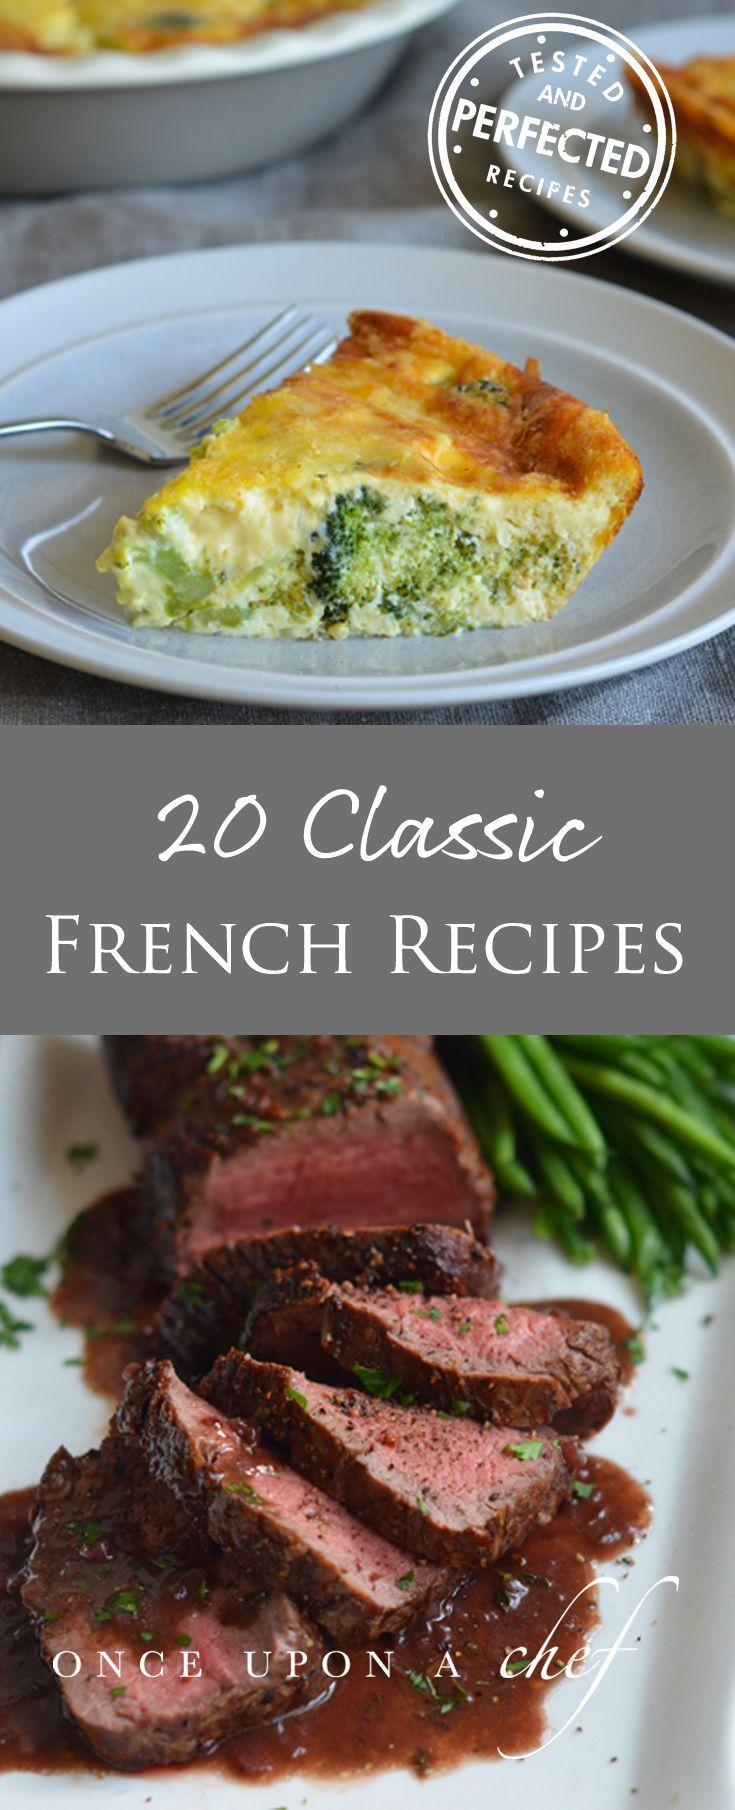 Ooh La La!  20 Classic French Recipes You'll Swoon Over